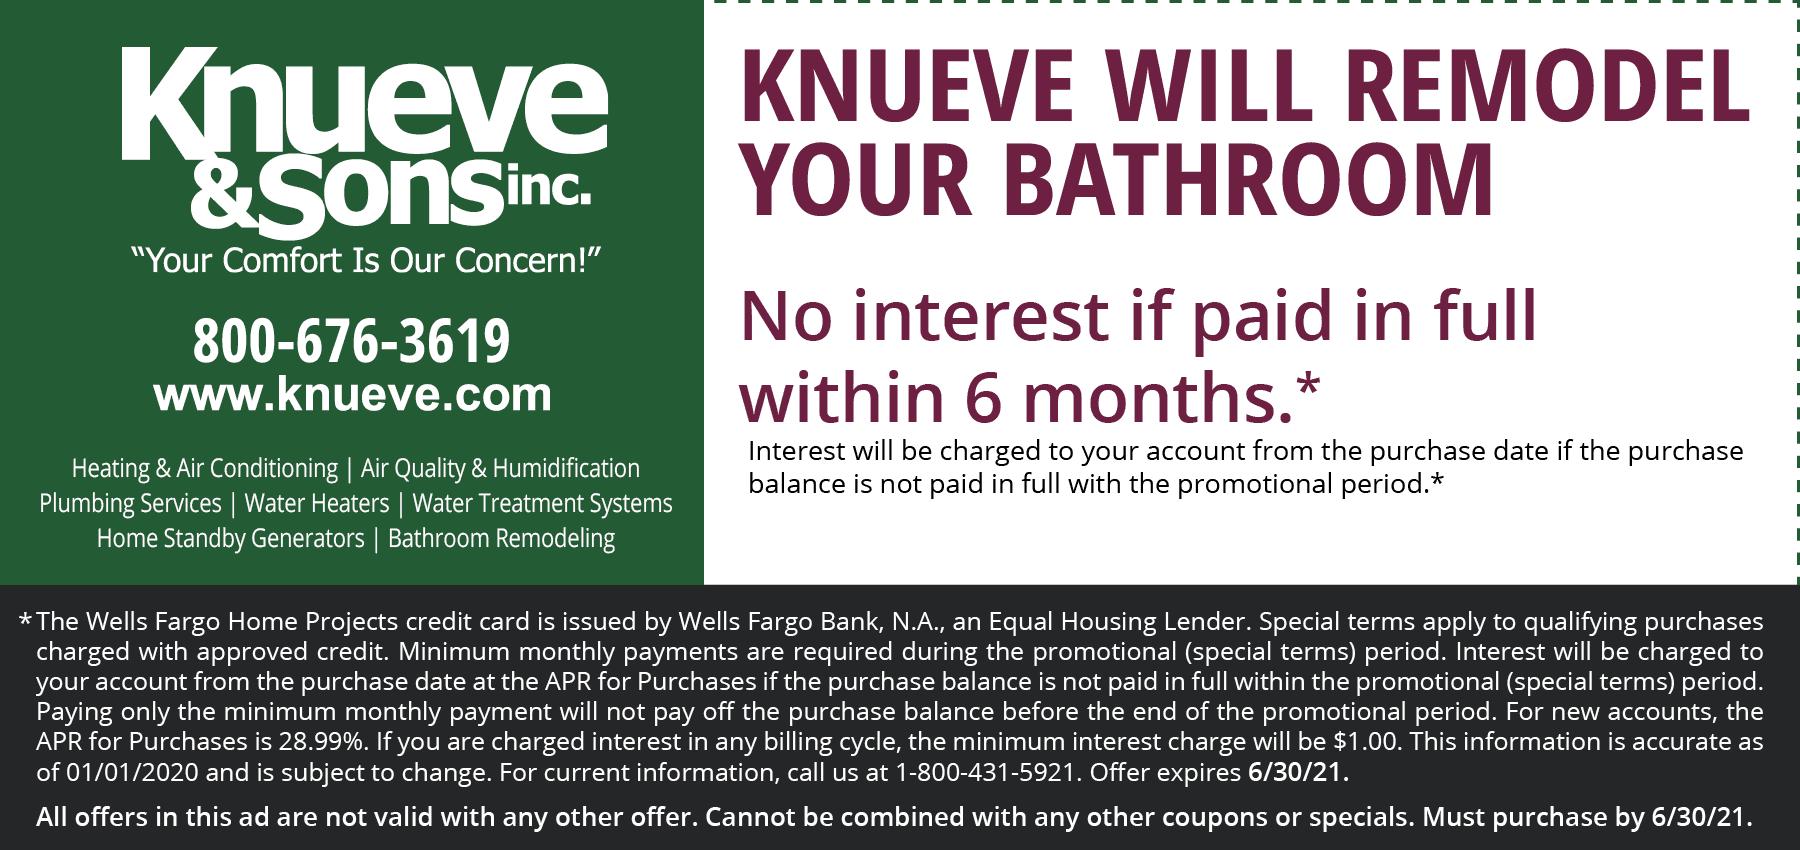 KNU-bathroom-coupon